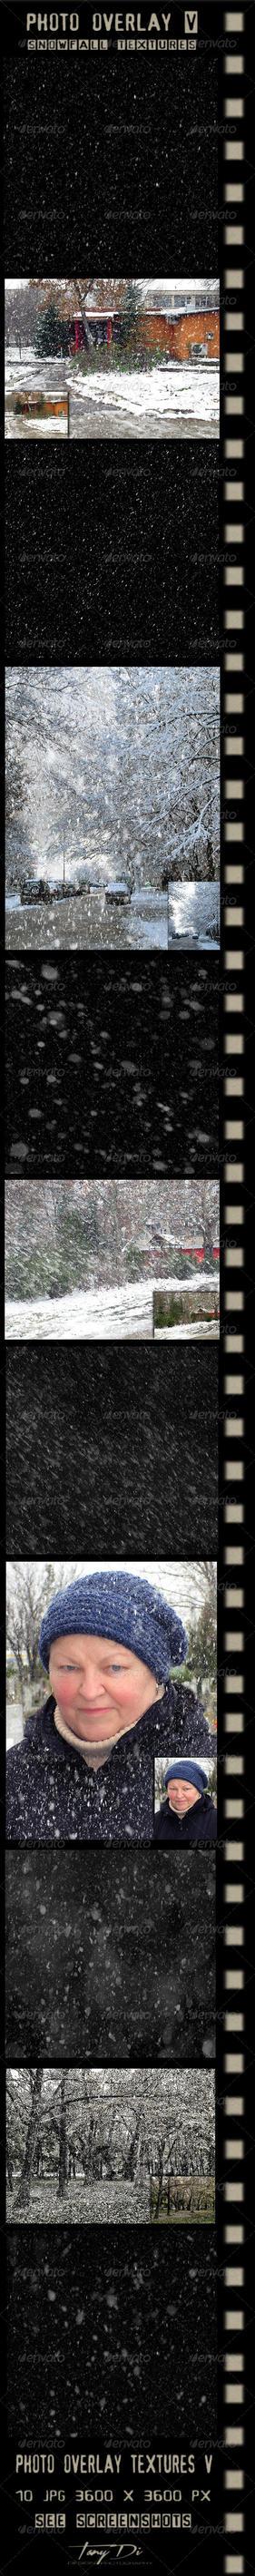 Photo Overlay V | Snowfall Textures | GR by AzureRayArt